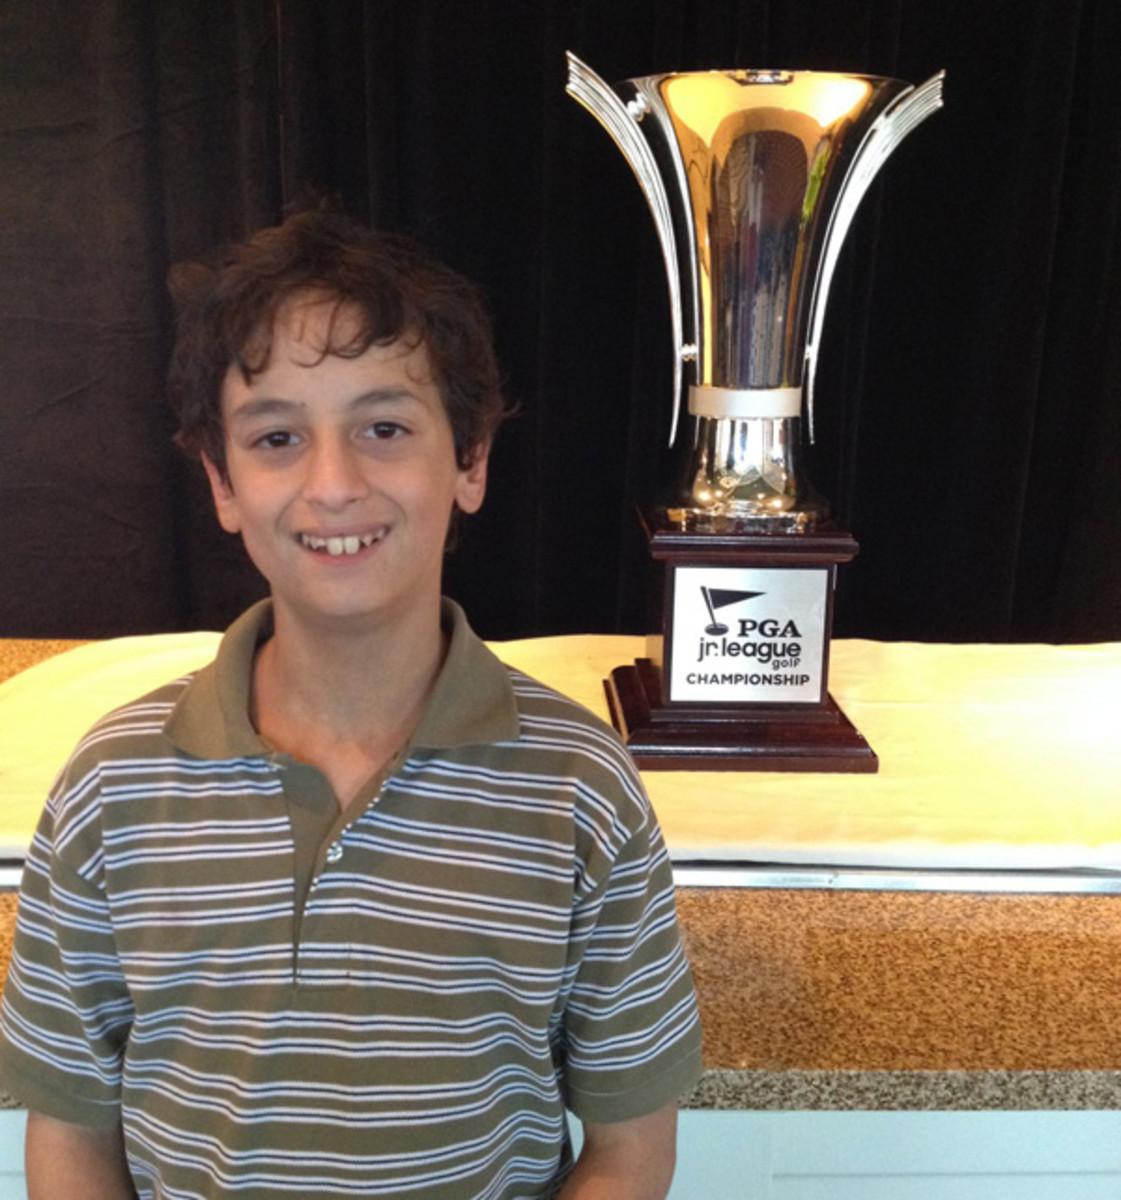 pga junior league golf championship trophy